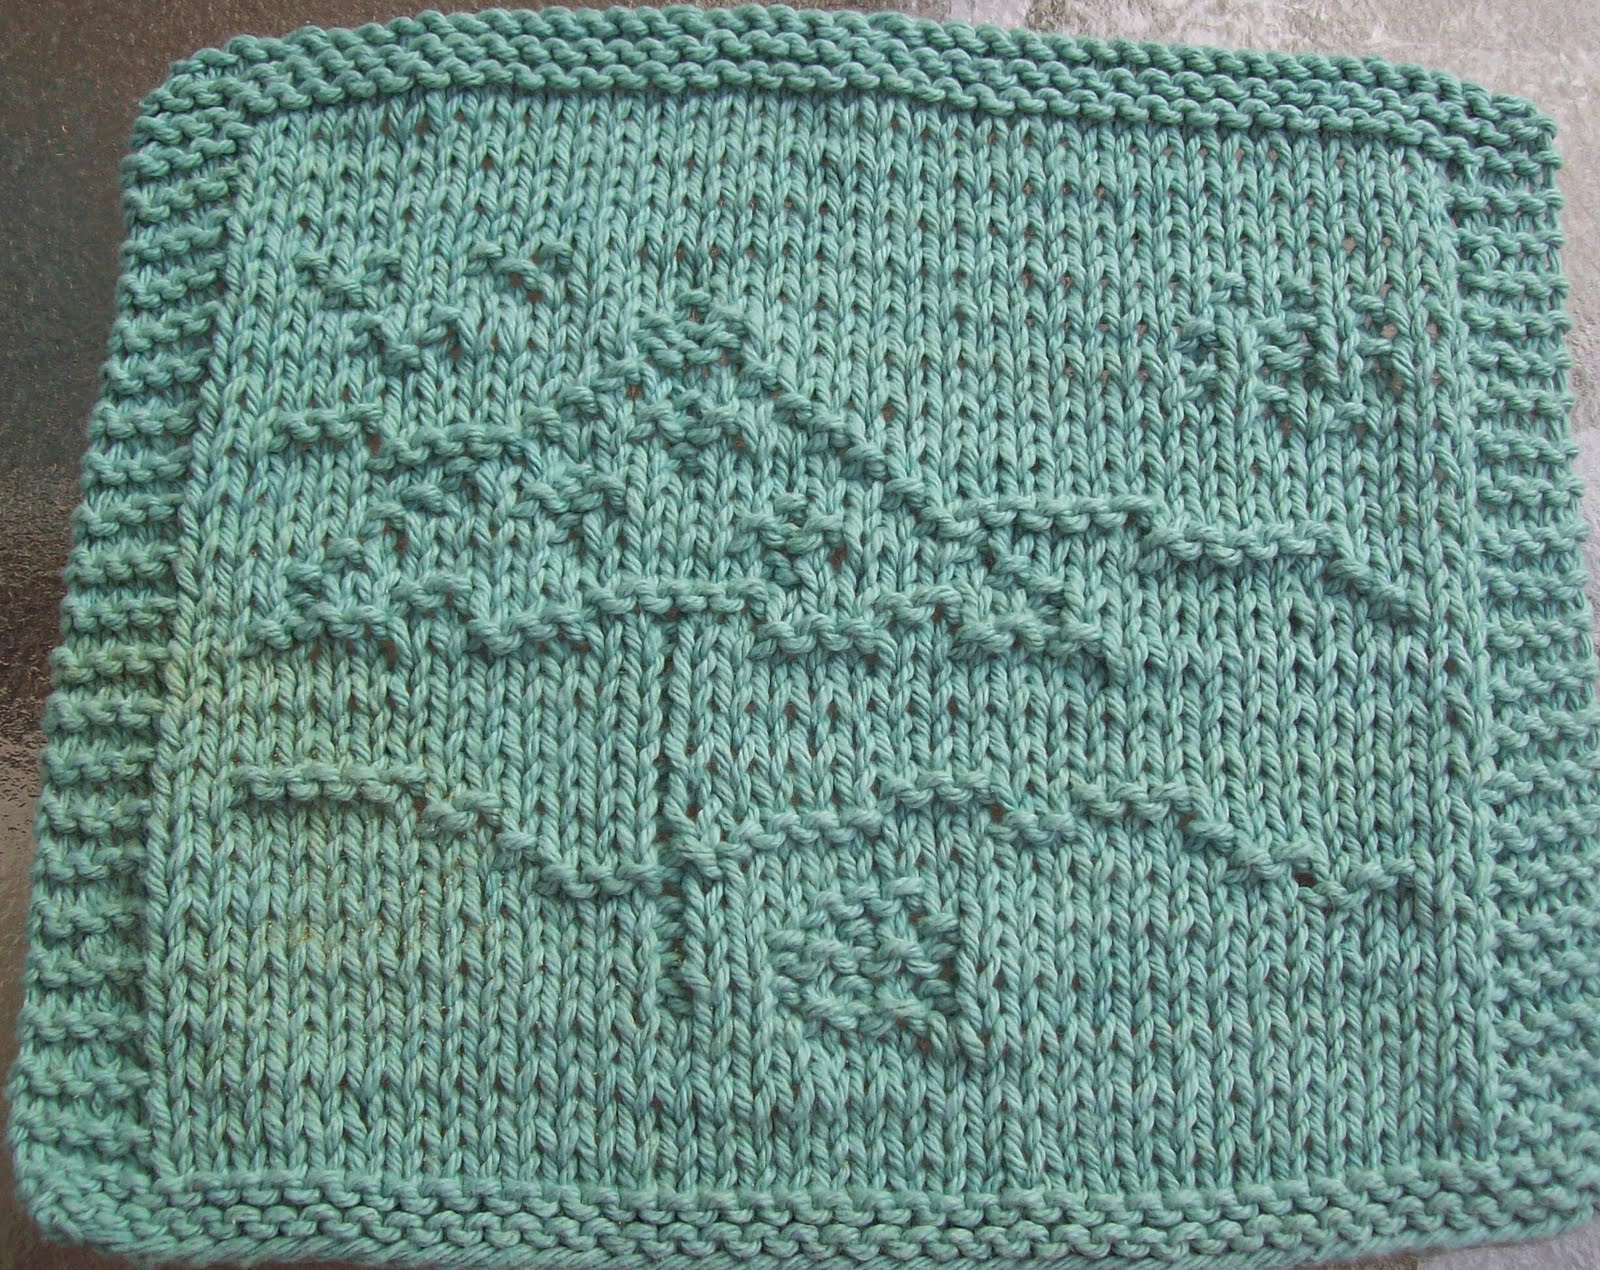 Umbrella Knitting Pattern : Digknitty designs beach umbrella too knit dishcloth pattern